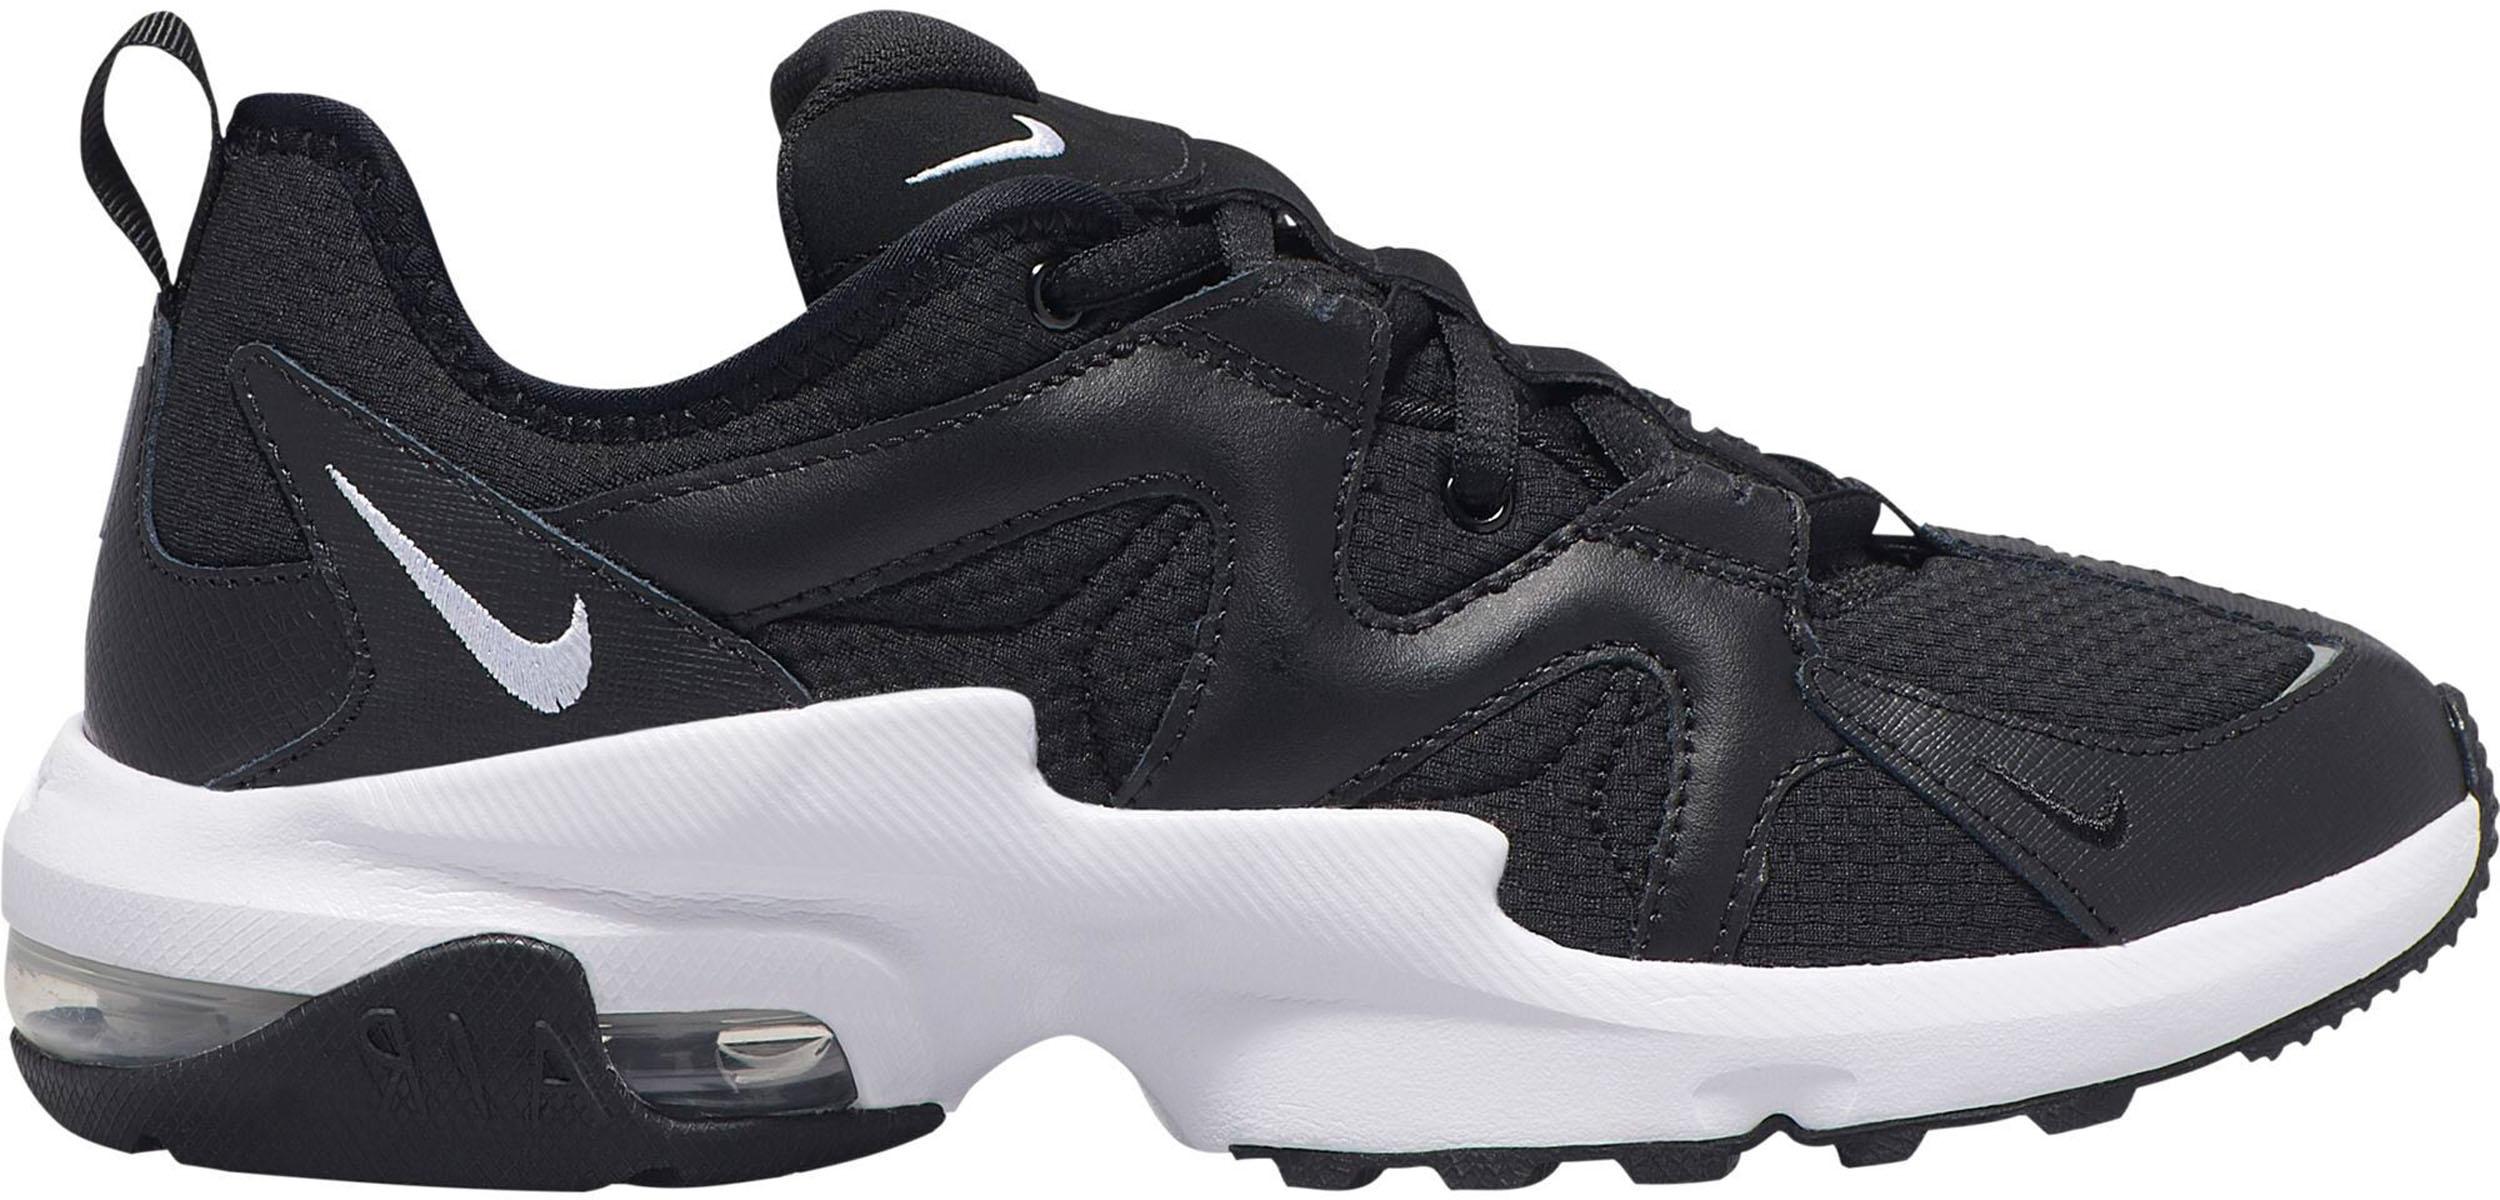 Nike obuv AIR MAX GRAVITION black Velikost: 8